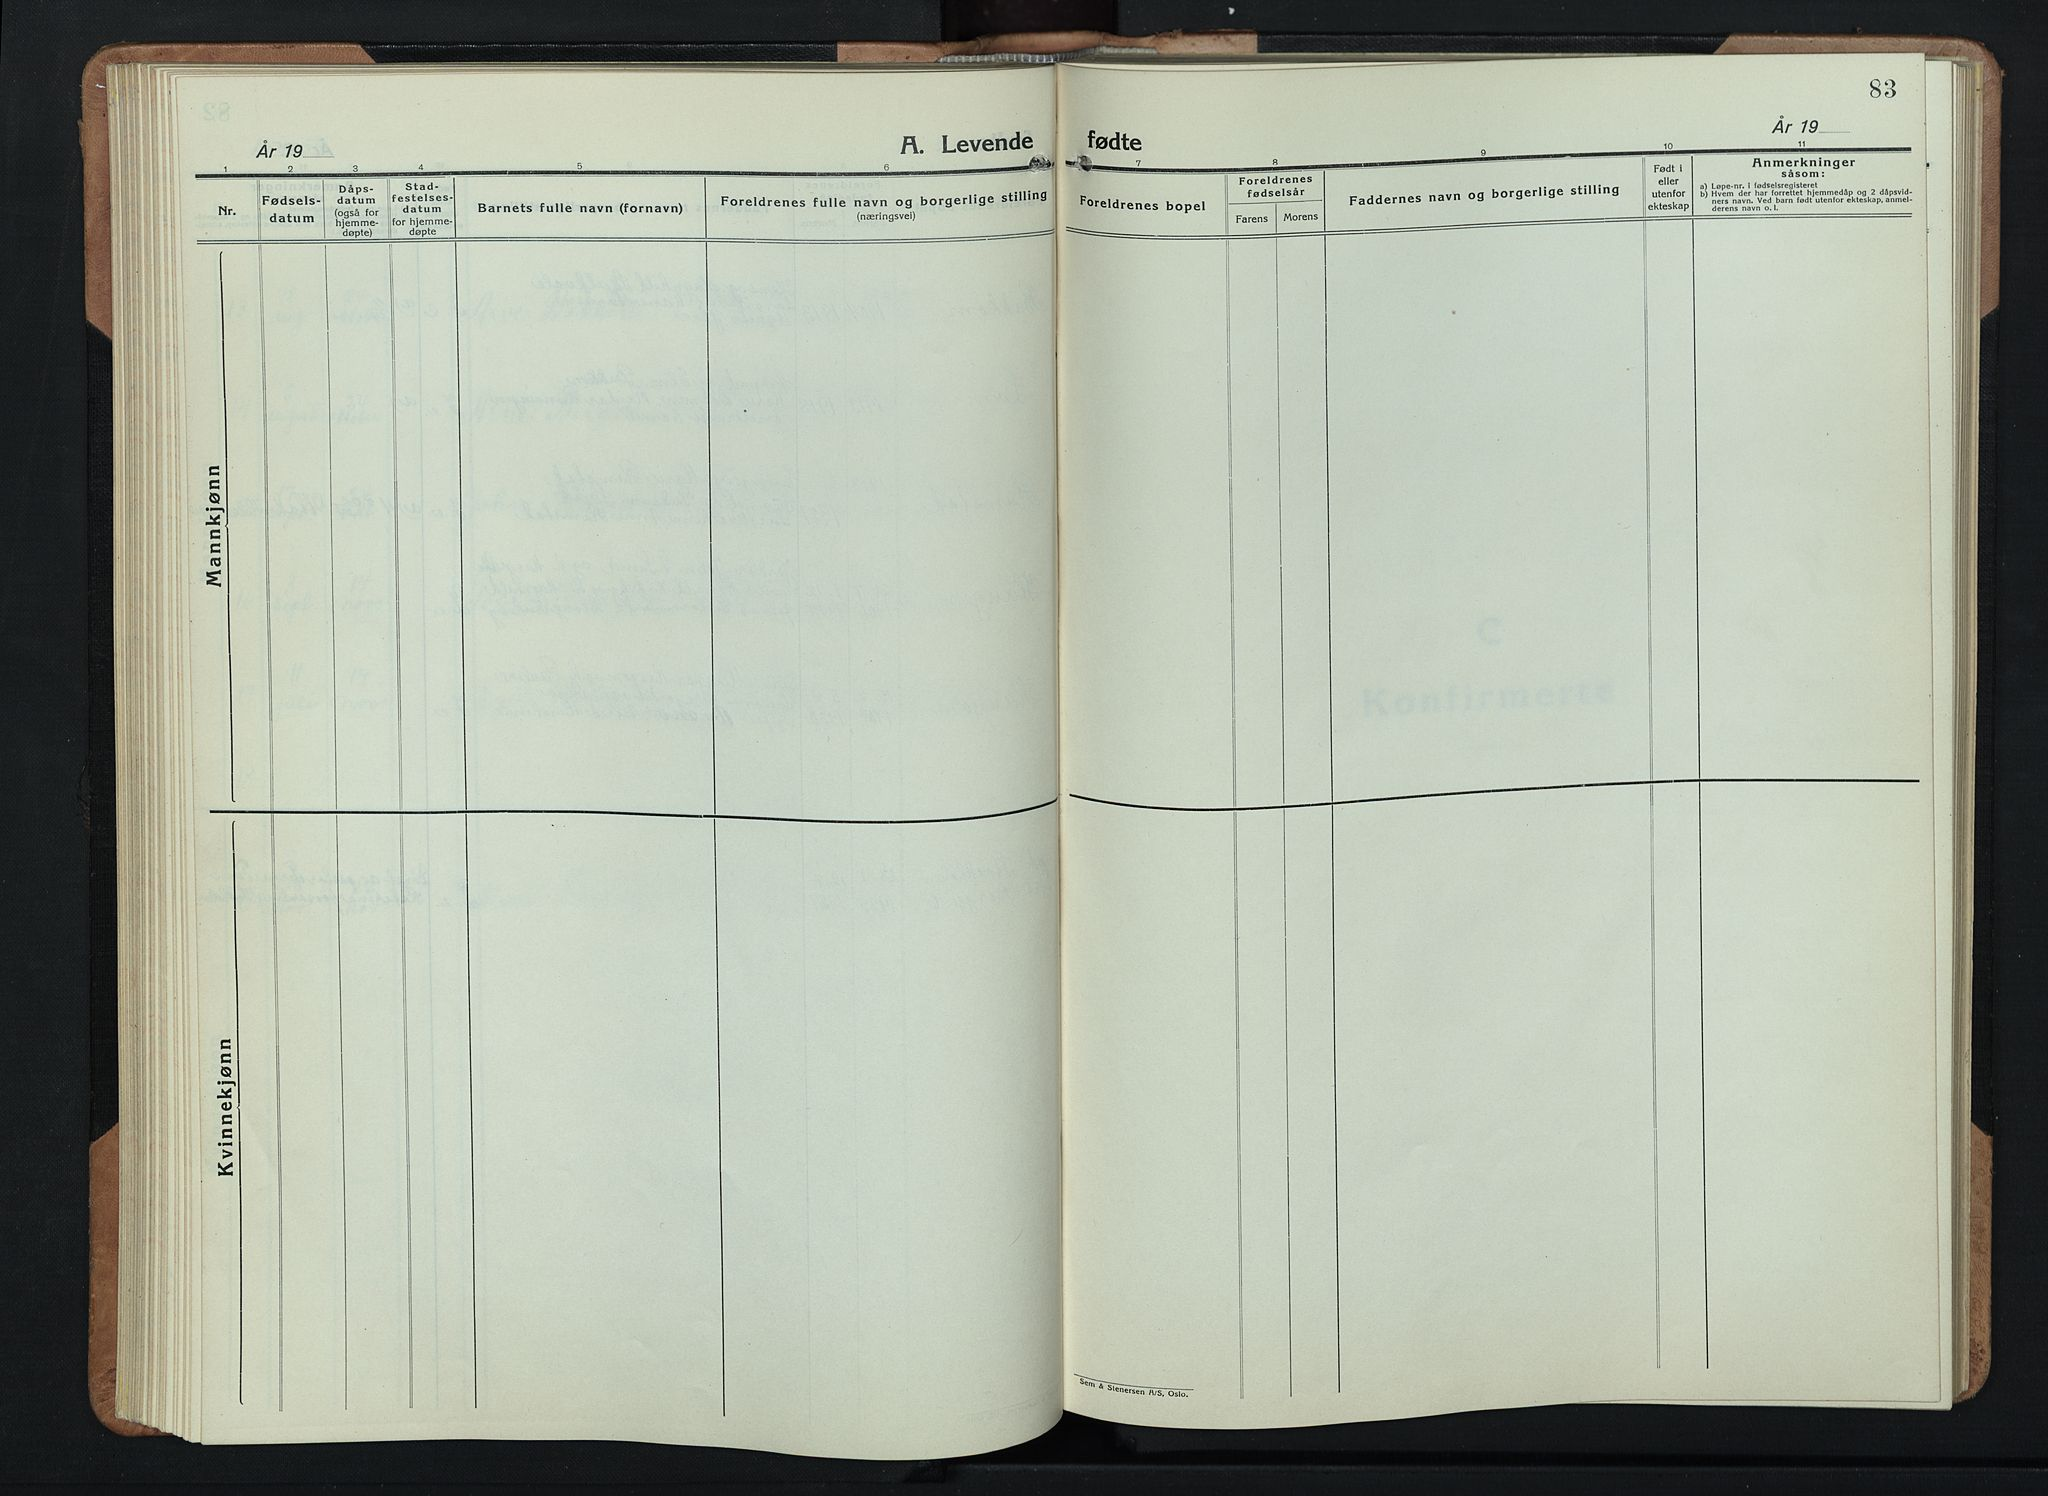 SAH, Skjåk prestekontor, Klokkerbok nr. 6, 1933-1954, s. 83